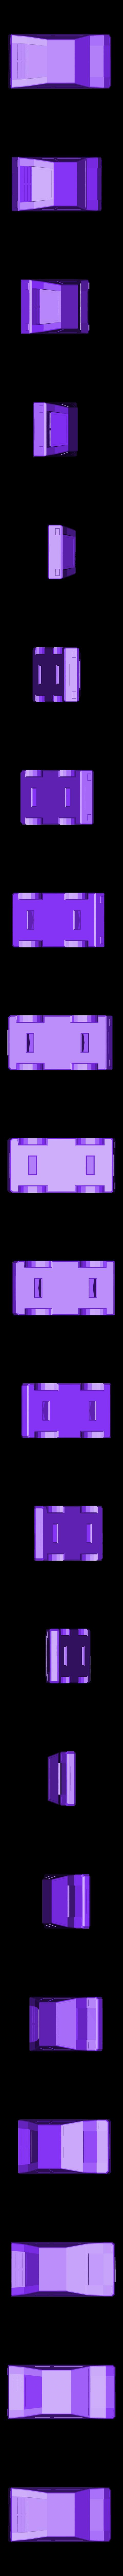 SmallToys-BodyCar3.stl Download STL file SmallToys - Cars pack • 3D print design, Wabby